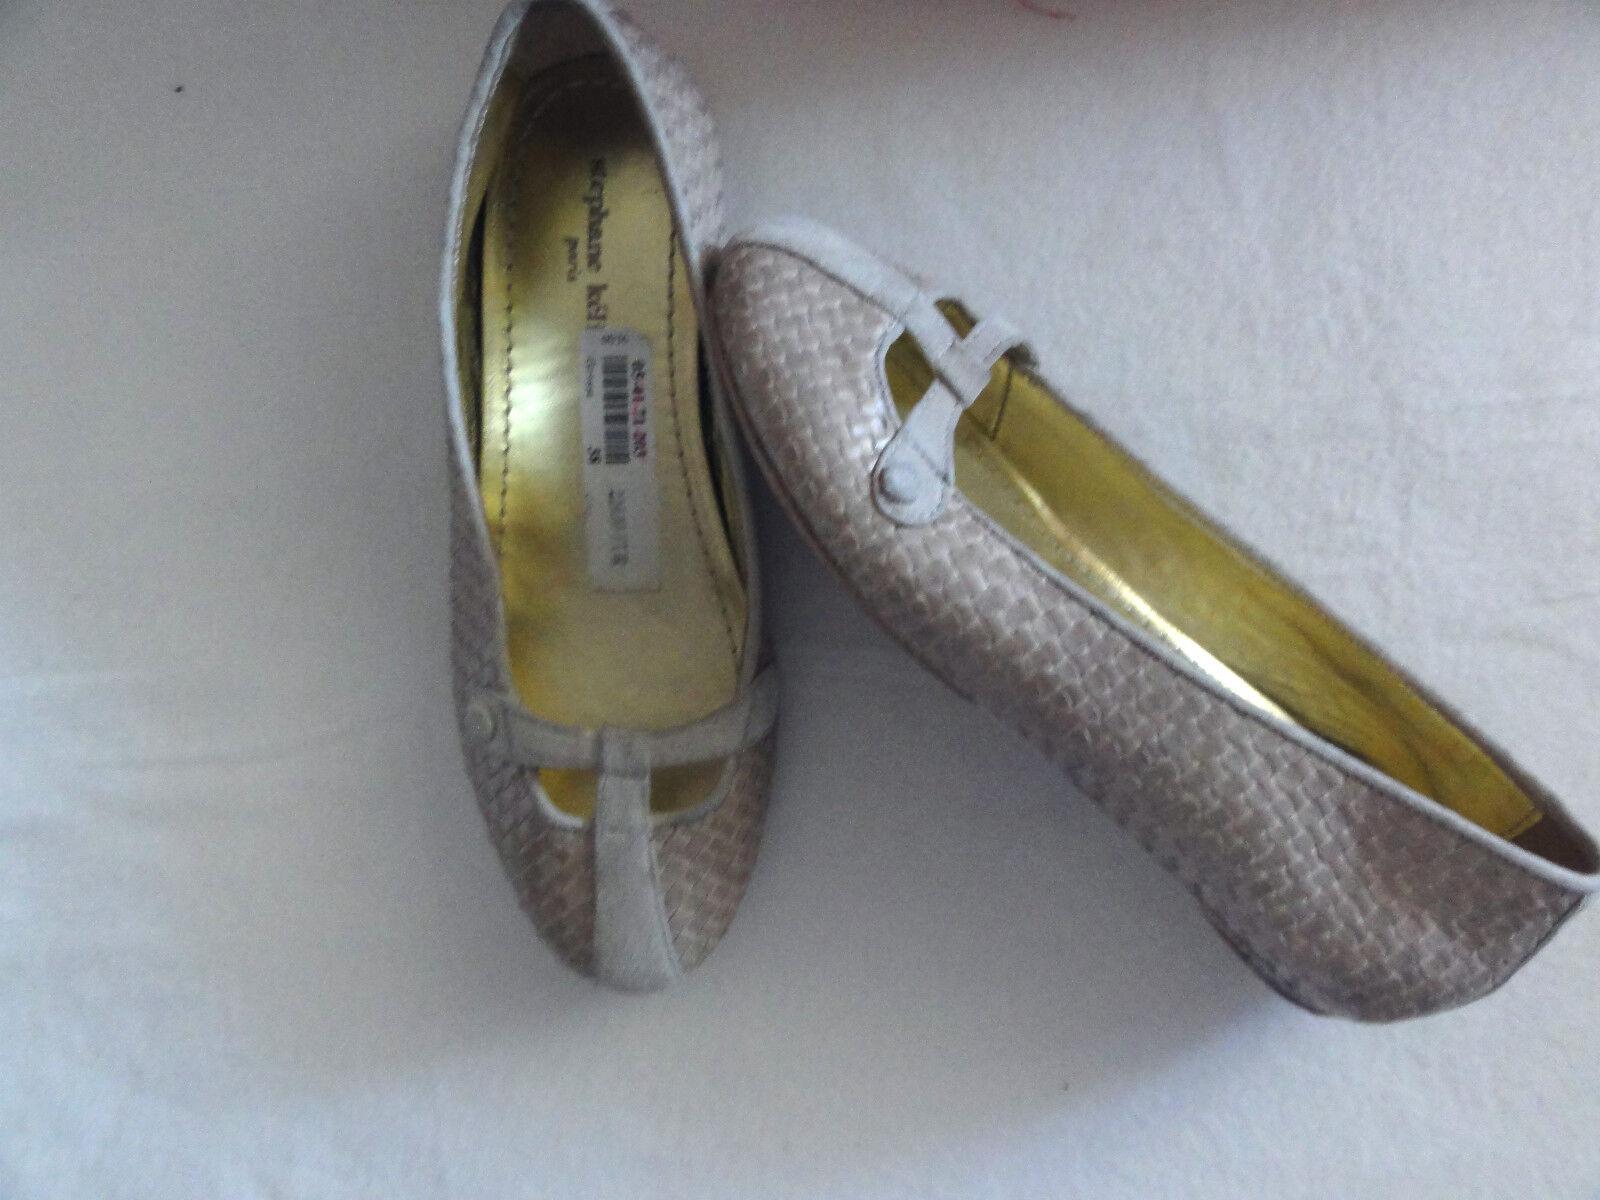 Stephane Kelian Paris, Leder Schuhe, Ballerinas,Gr. 37/38 in Beige NP-